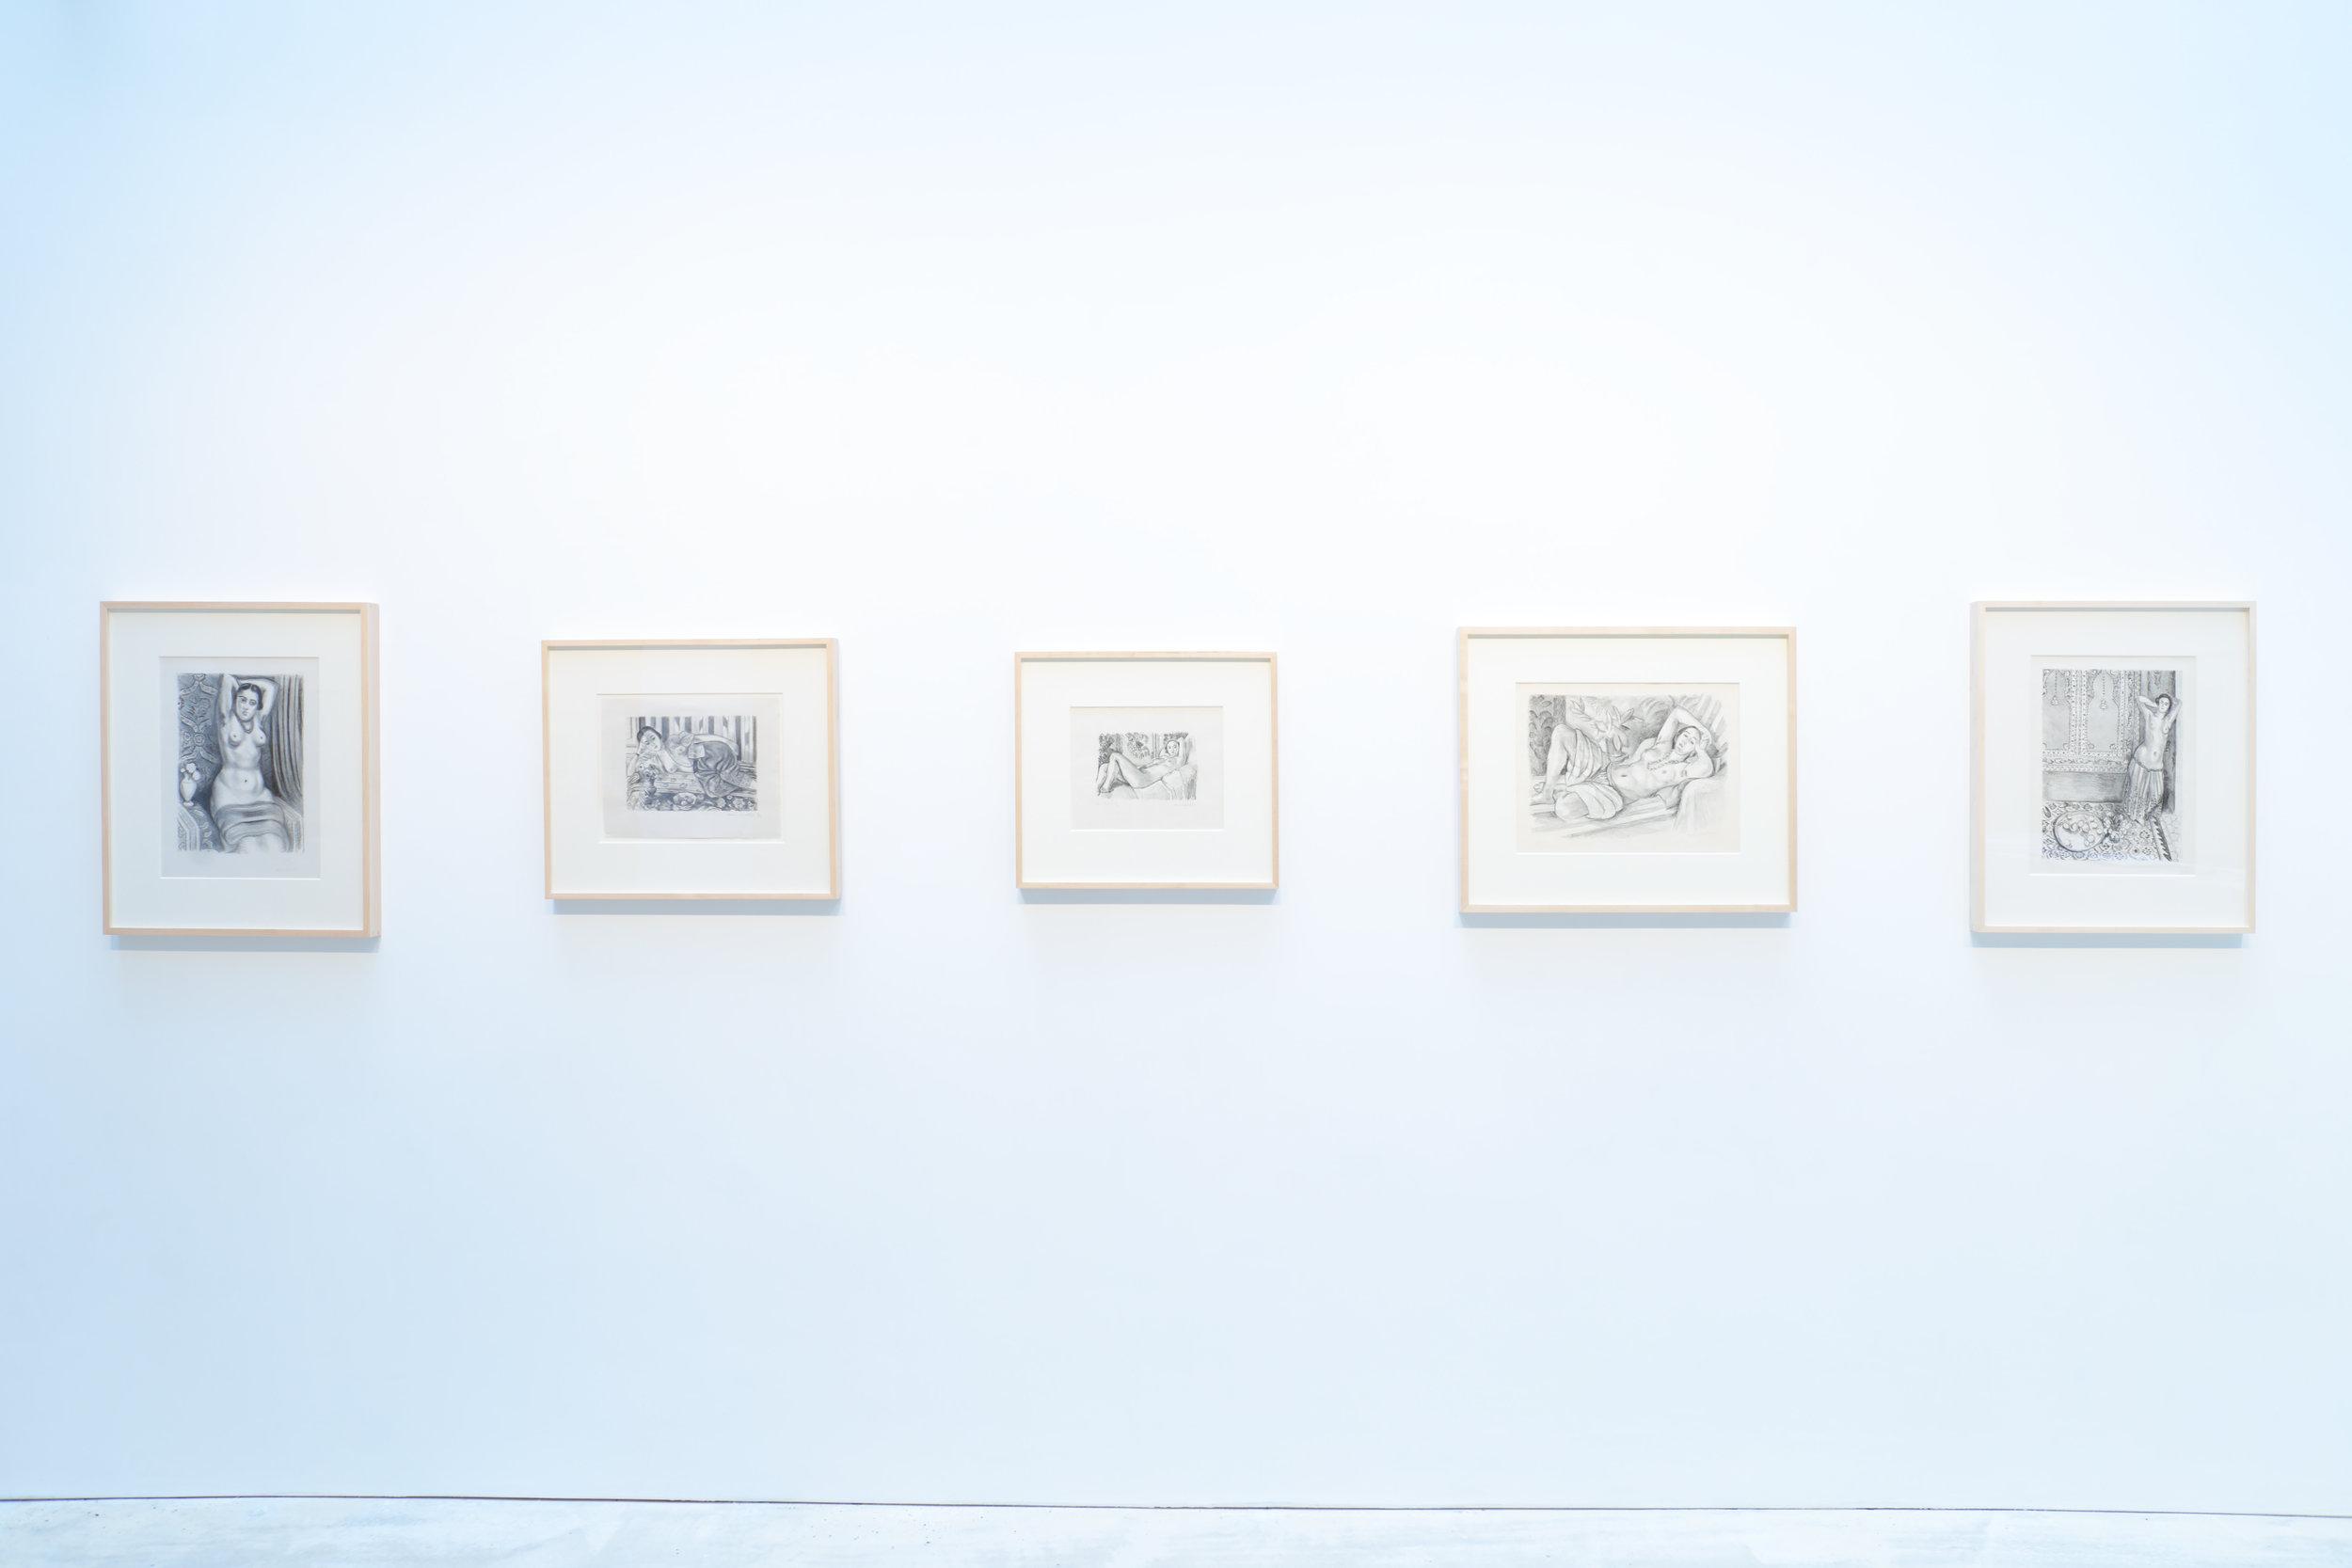 Matisse prints 2018 install 19.jpg